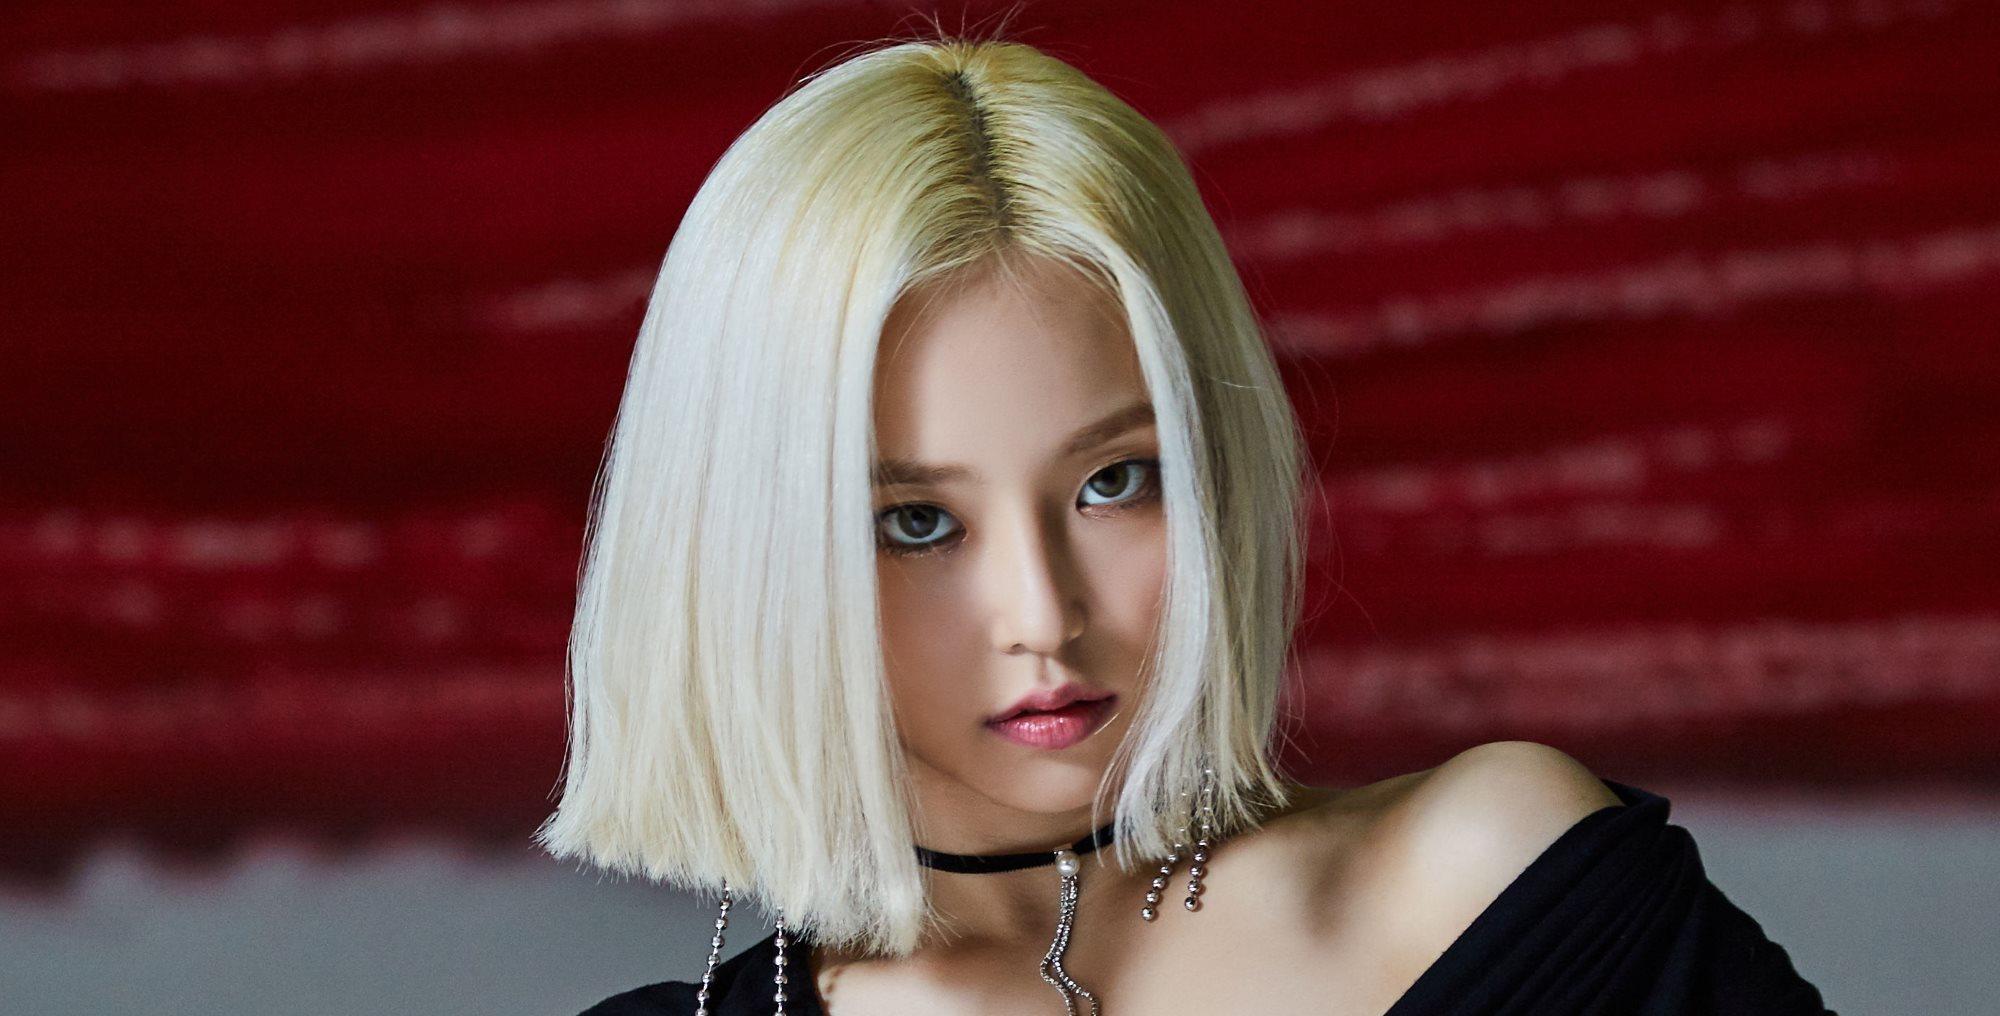 Wallpaper Girl Band Korea Clc South Korean Girls Group Members Profile Info